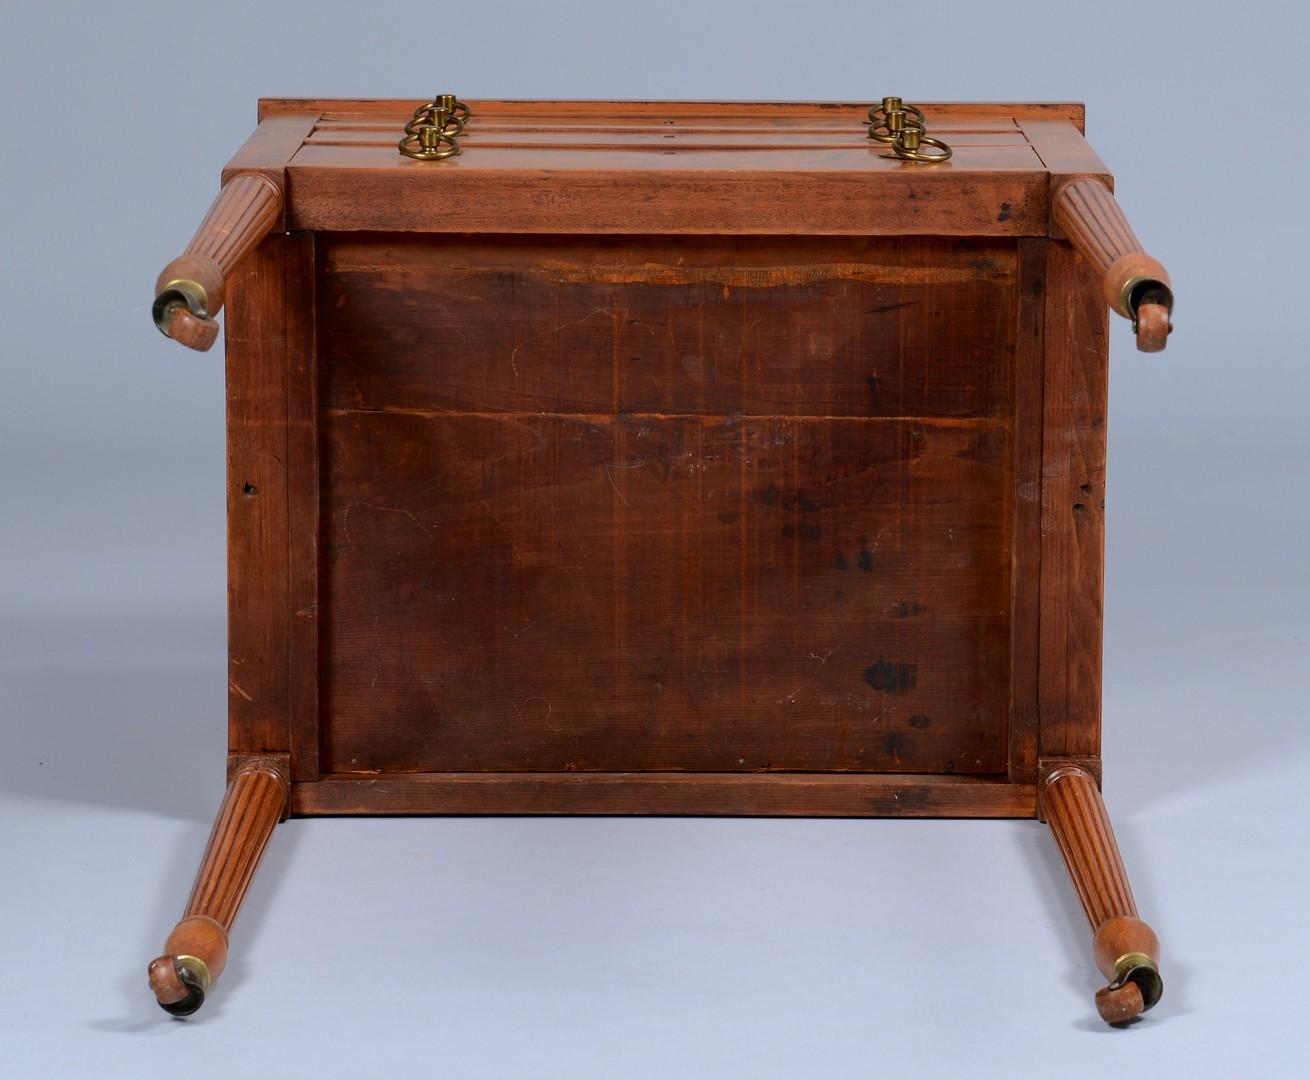 Lot 631: Sheraton Three-Drawer Work Table